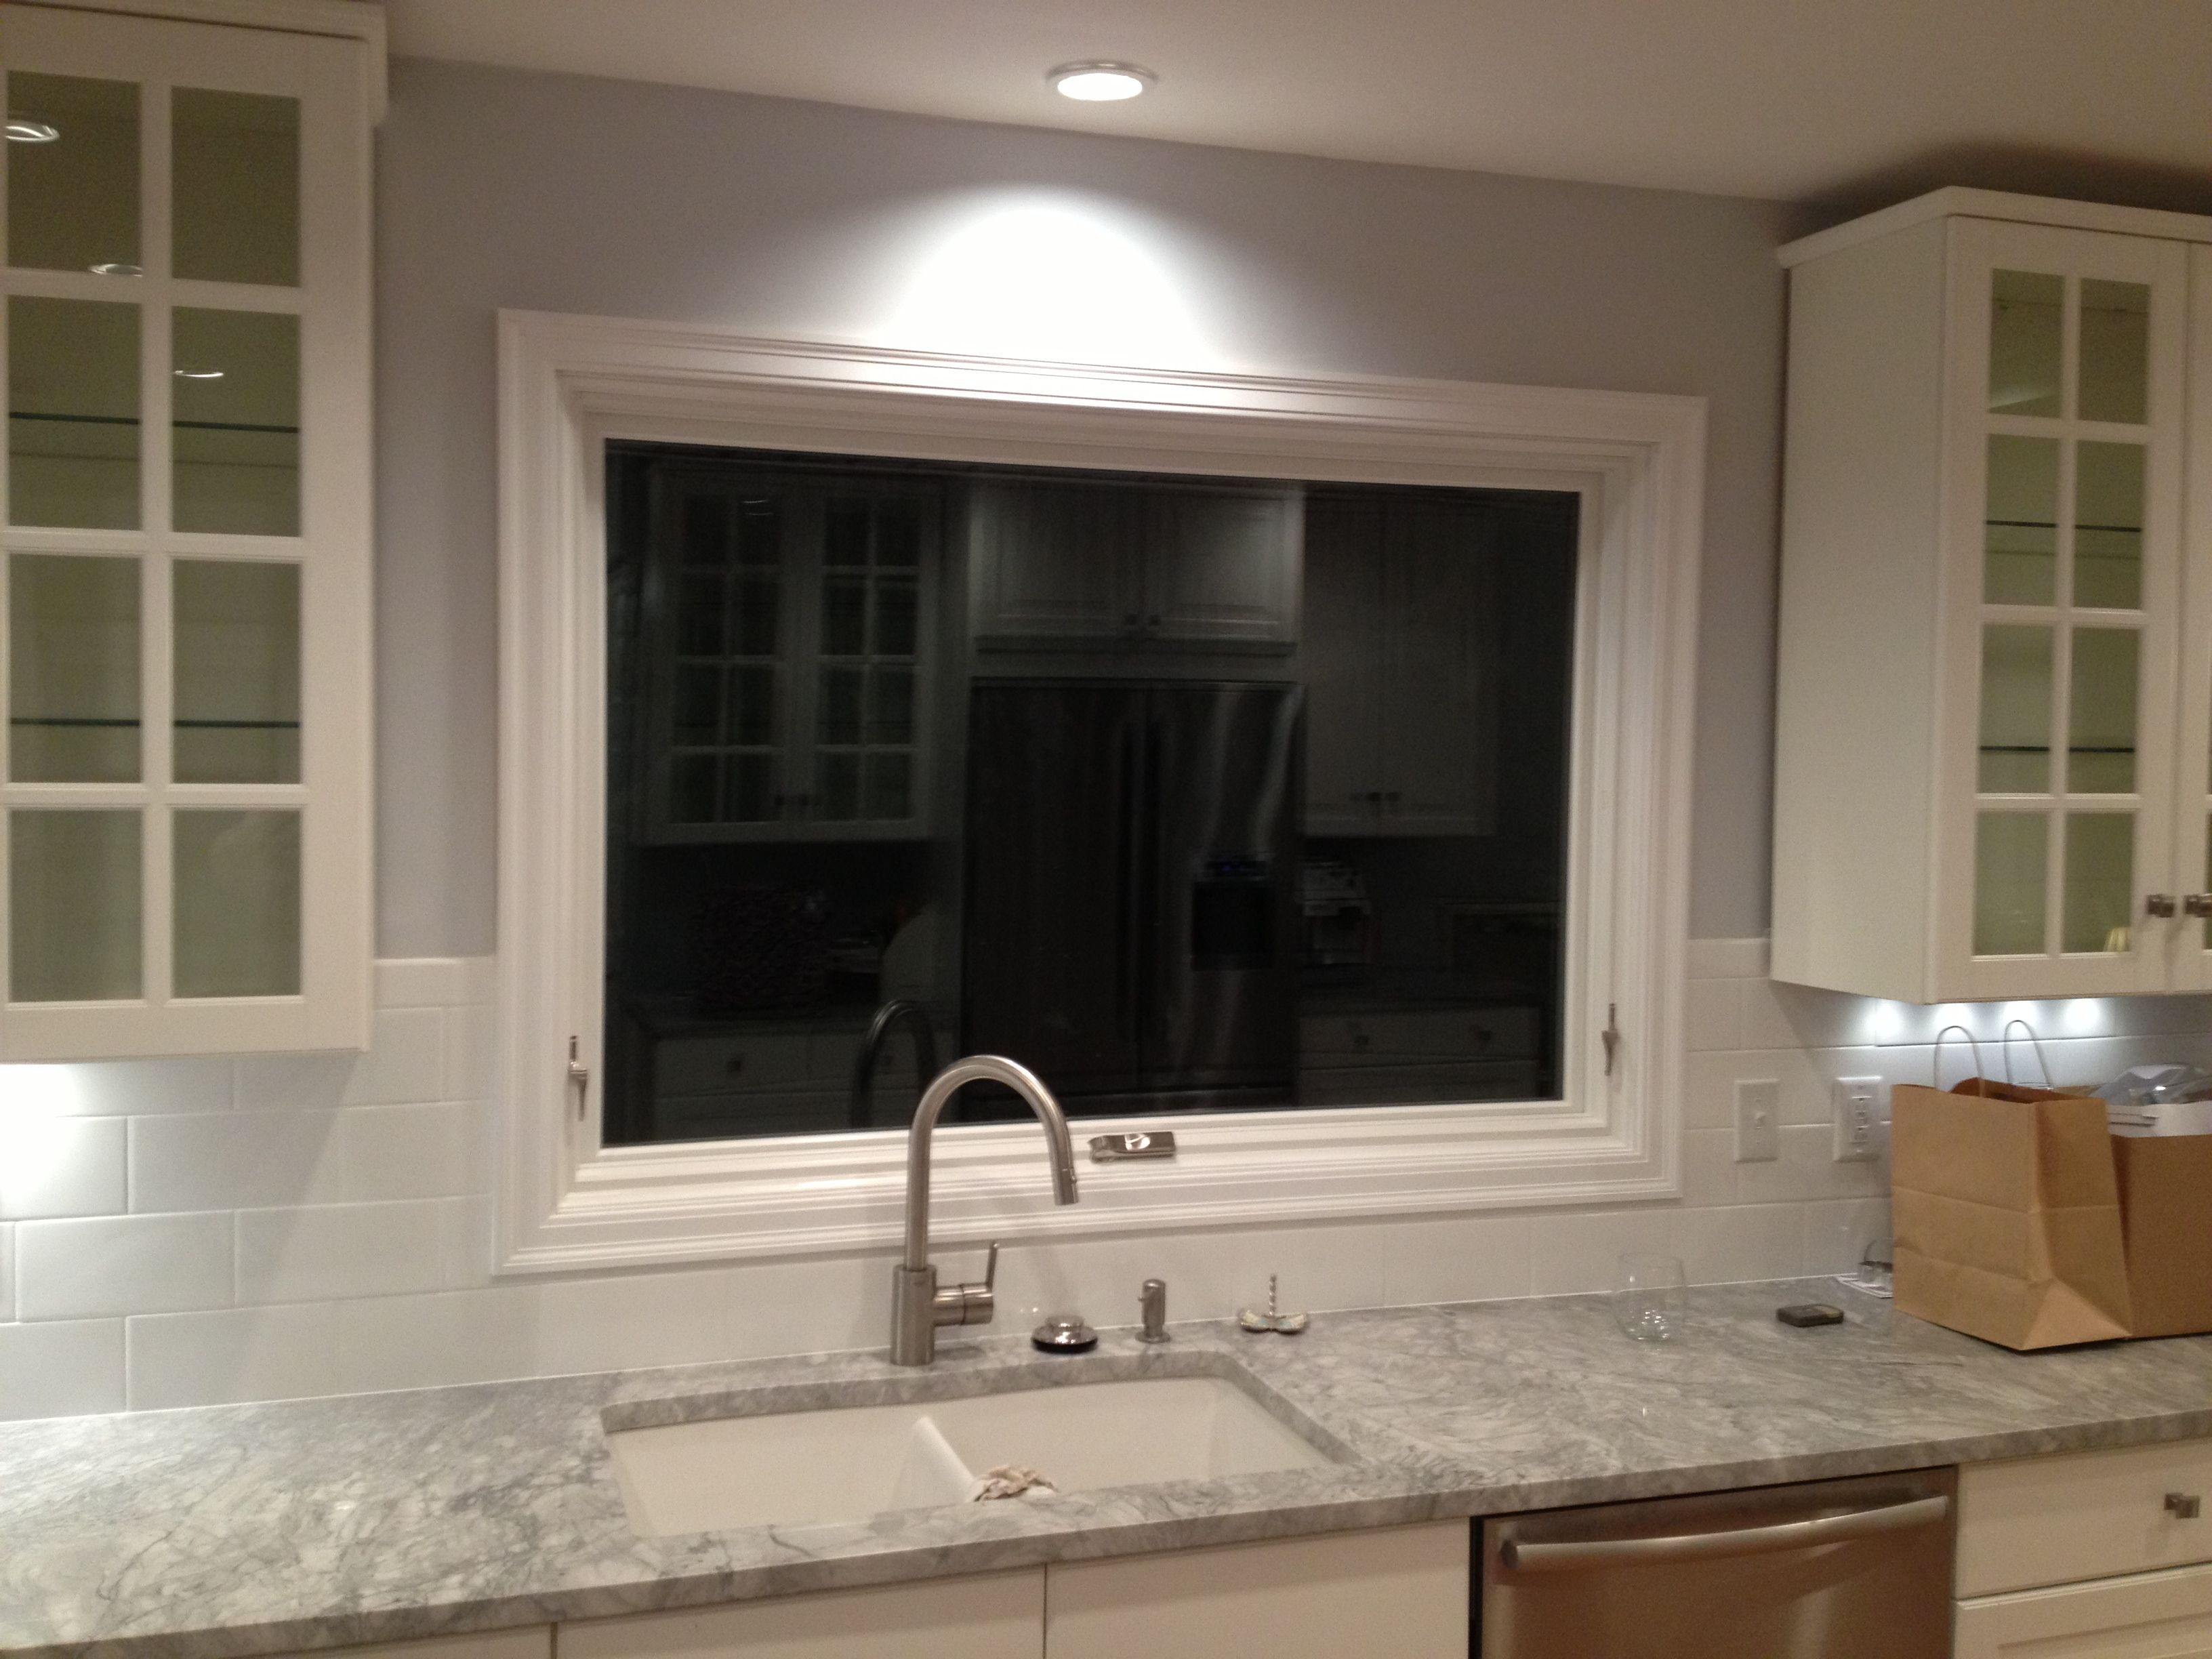 screen pella awning windows installation white insect window screens